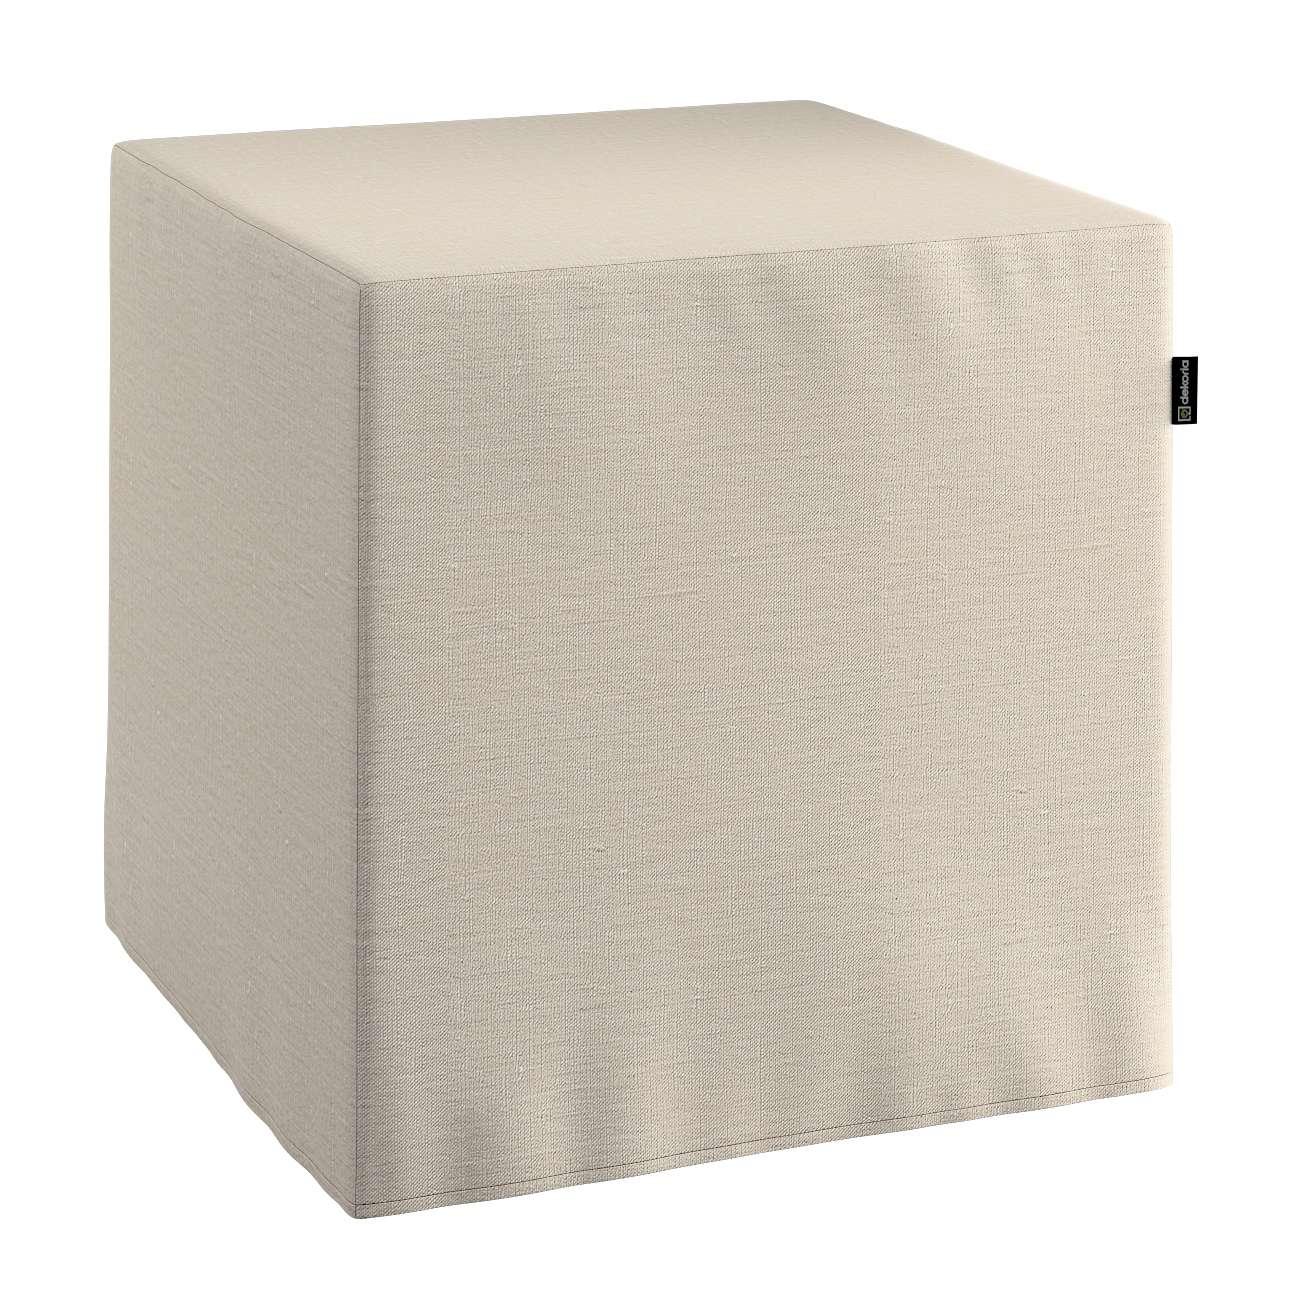 Pufa kostka twarda w kolekcji Linen, tkanina: 392-05